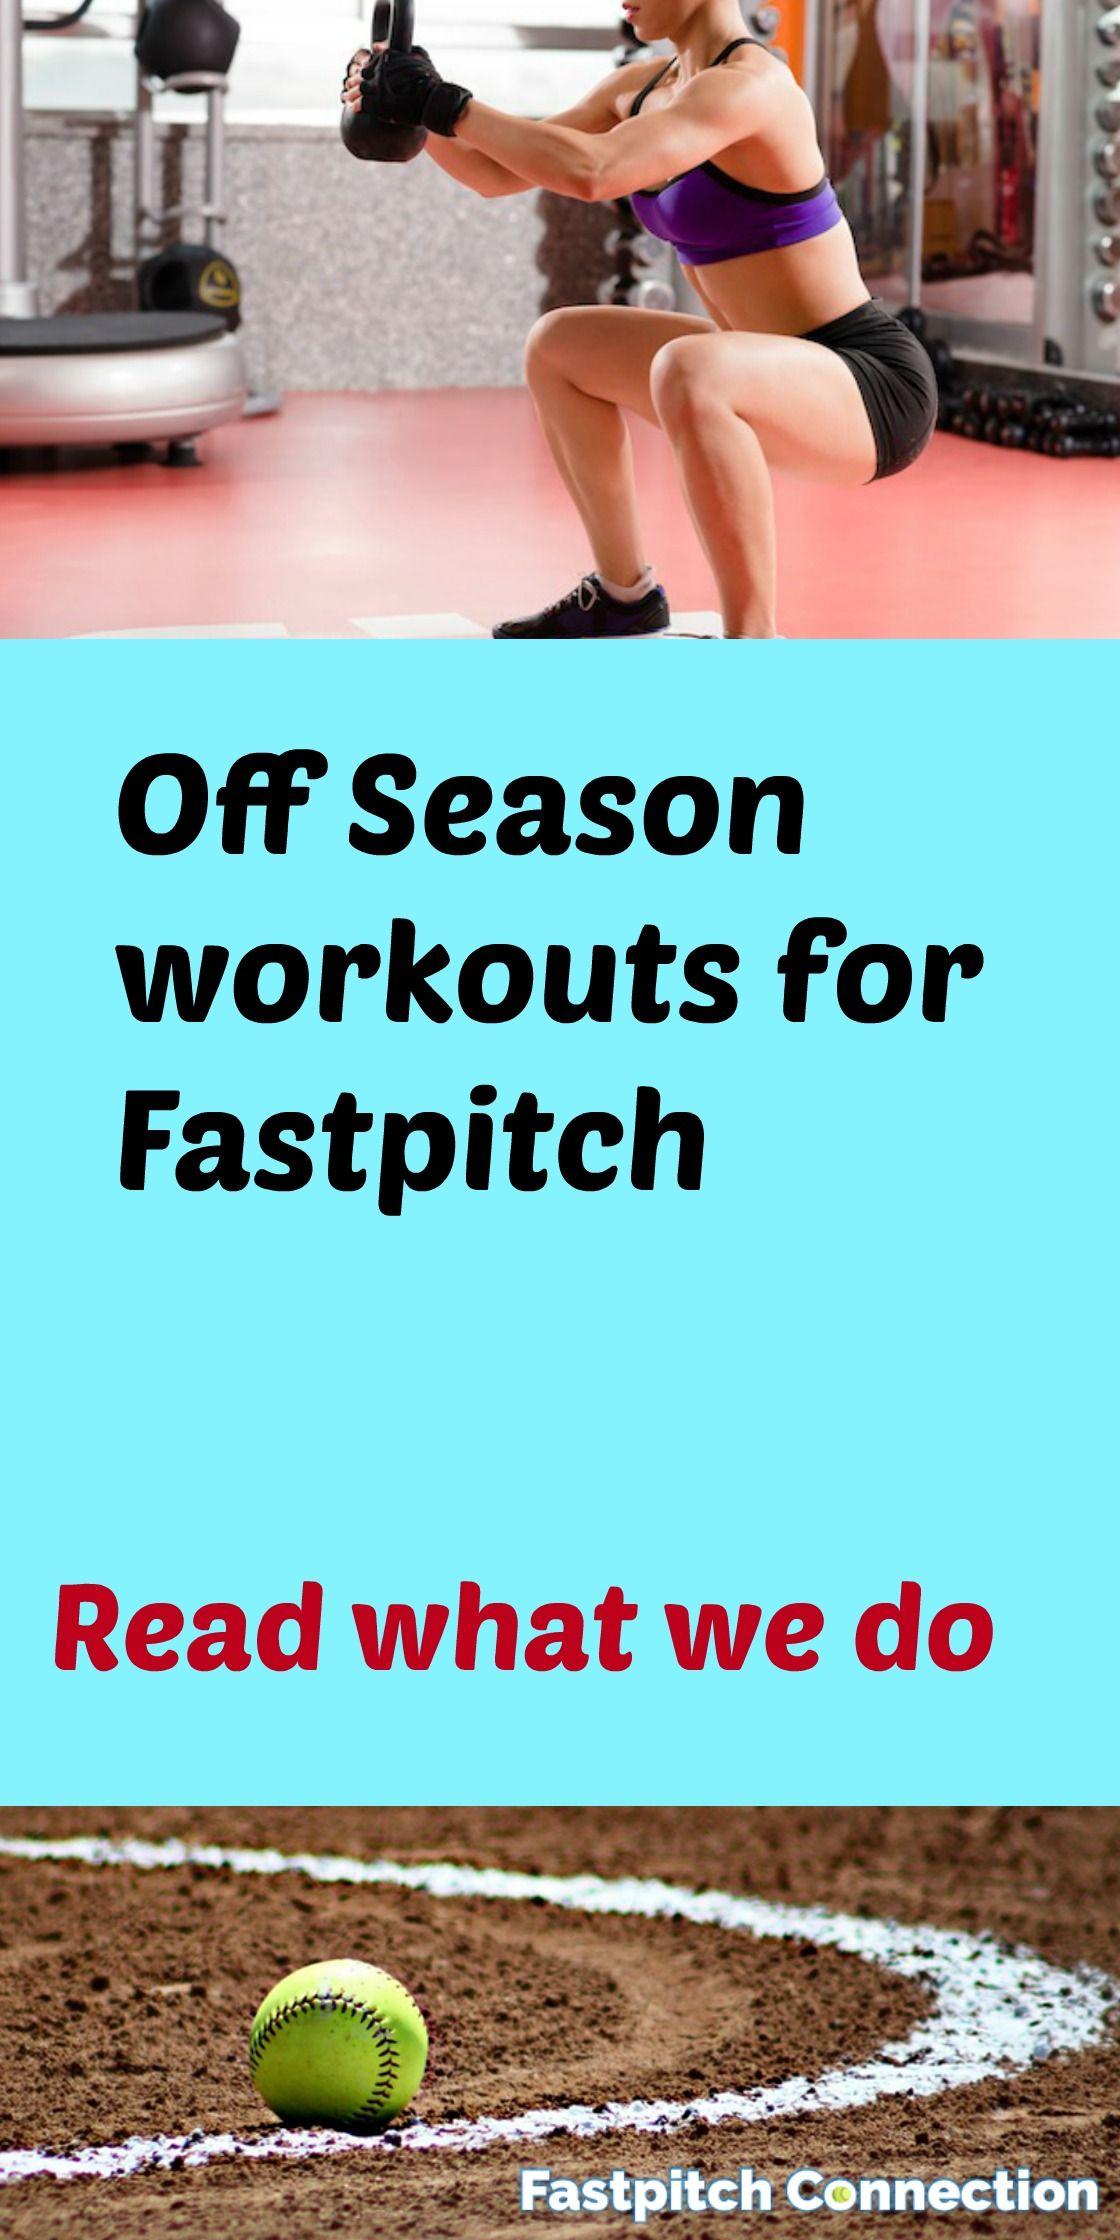 Off season workout programs for fastpitch - | Softball